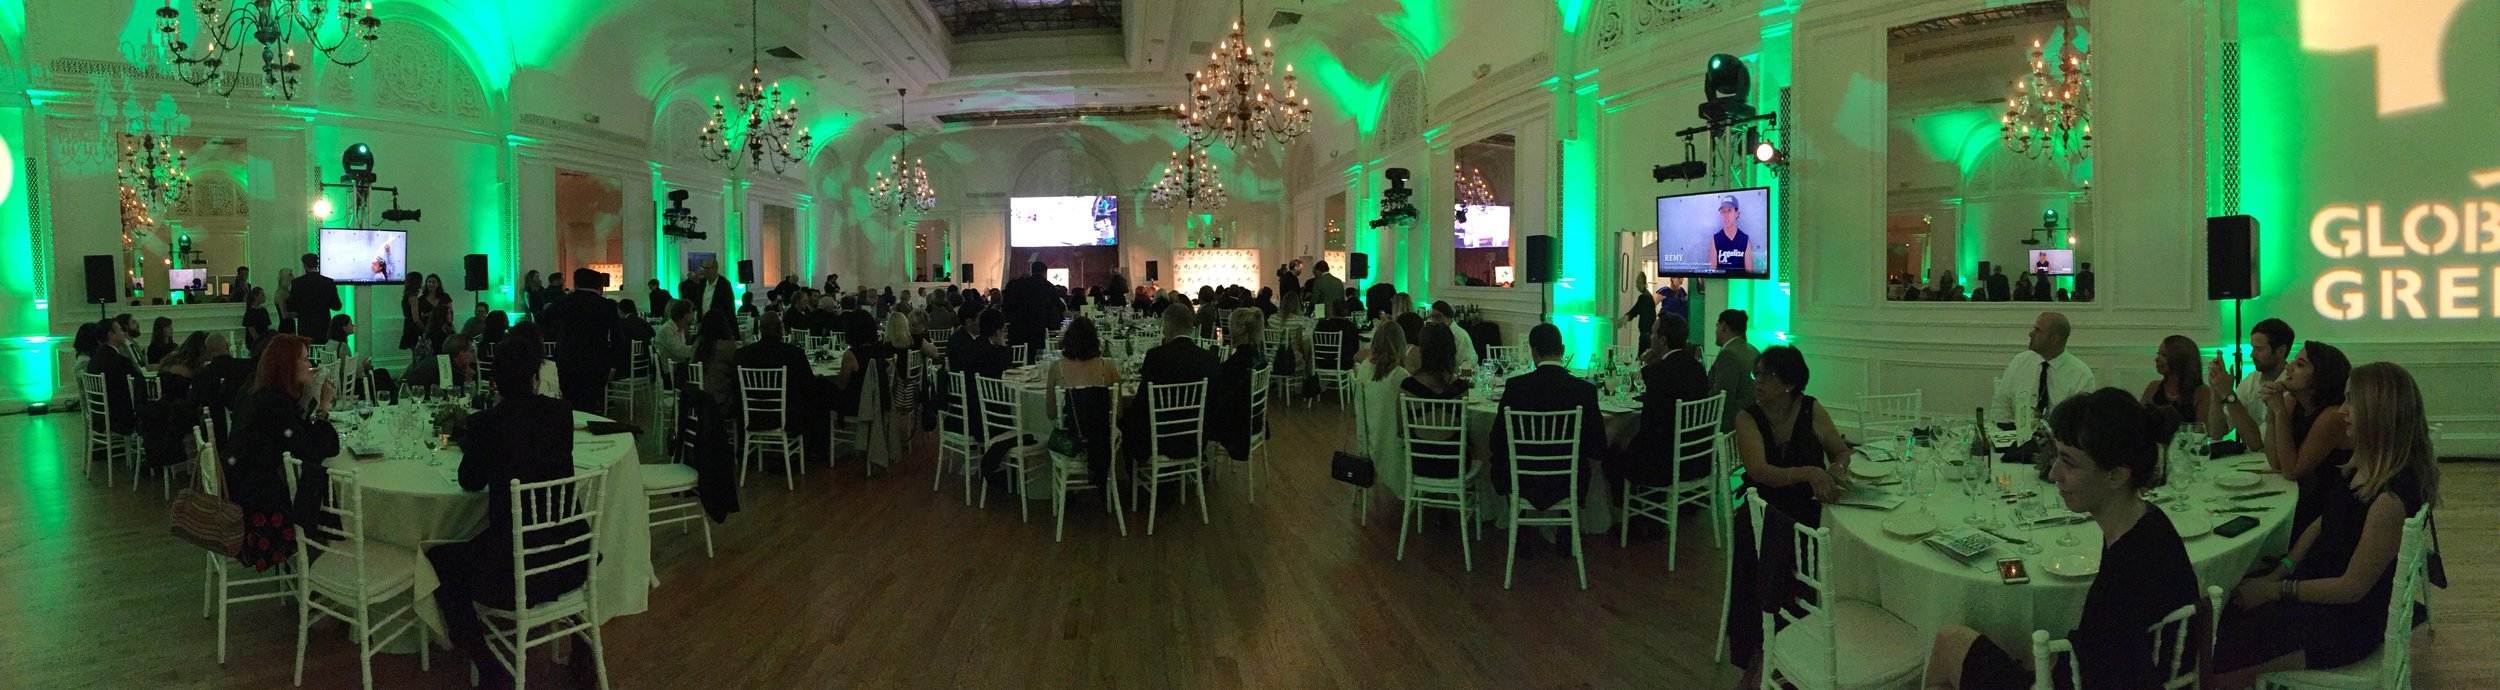 20th Annual Global Green Awards